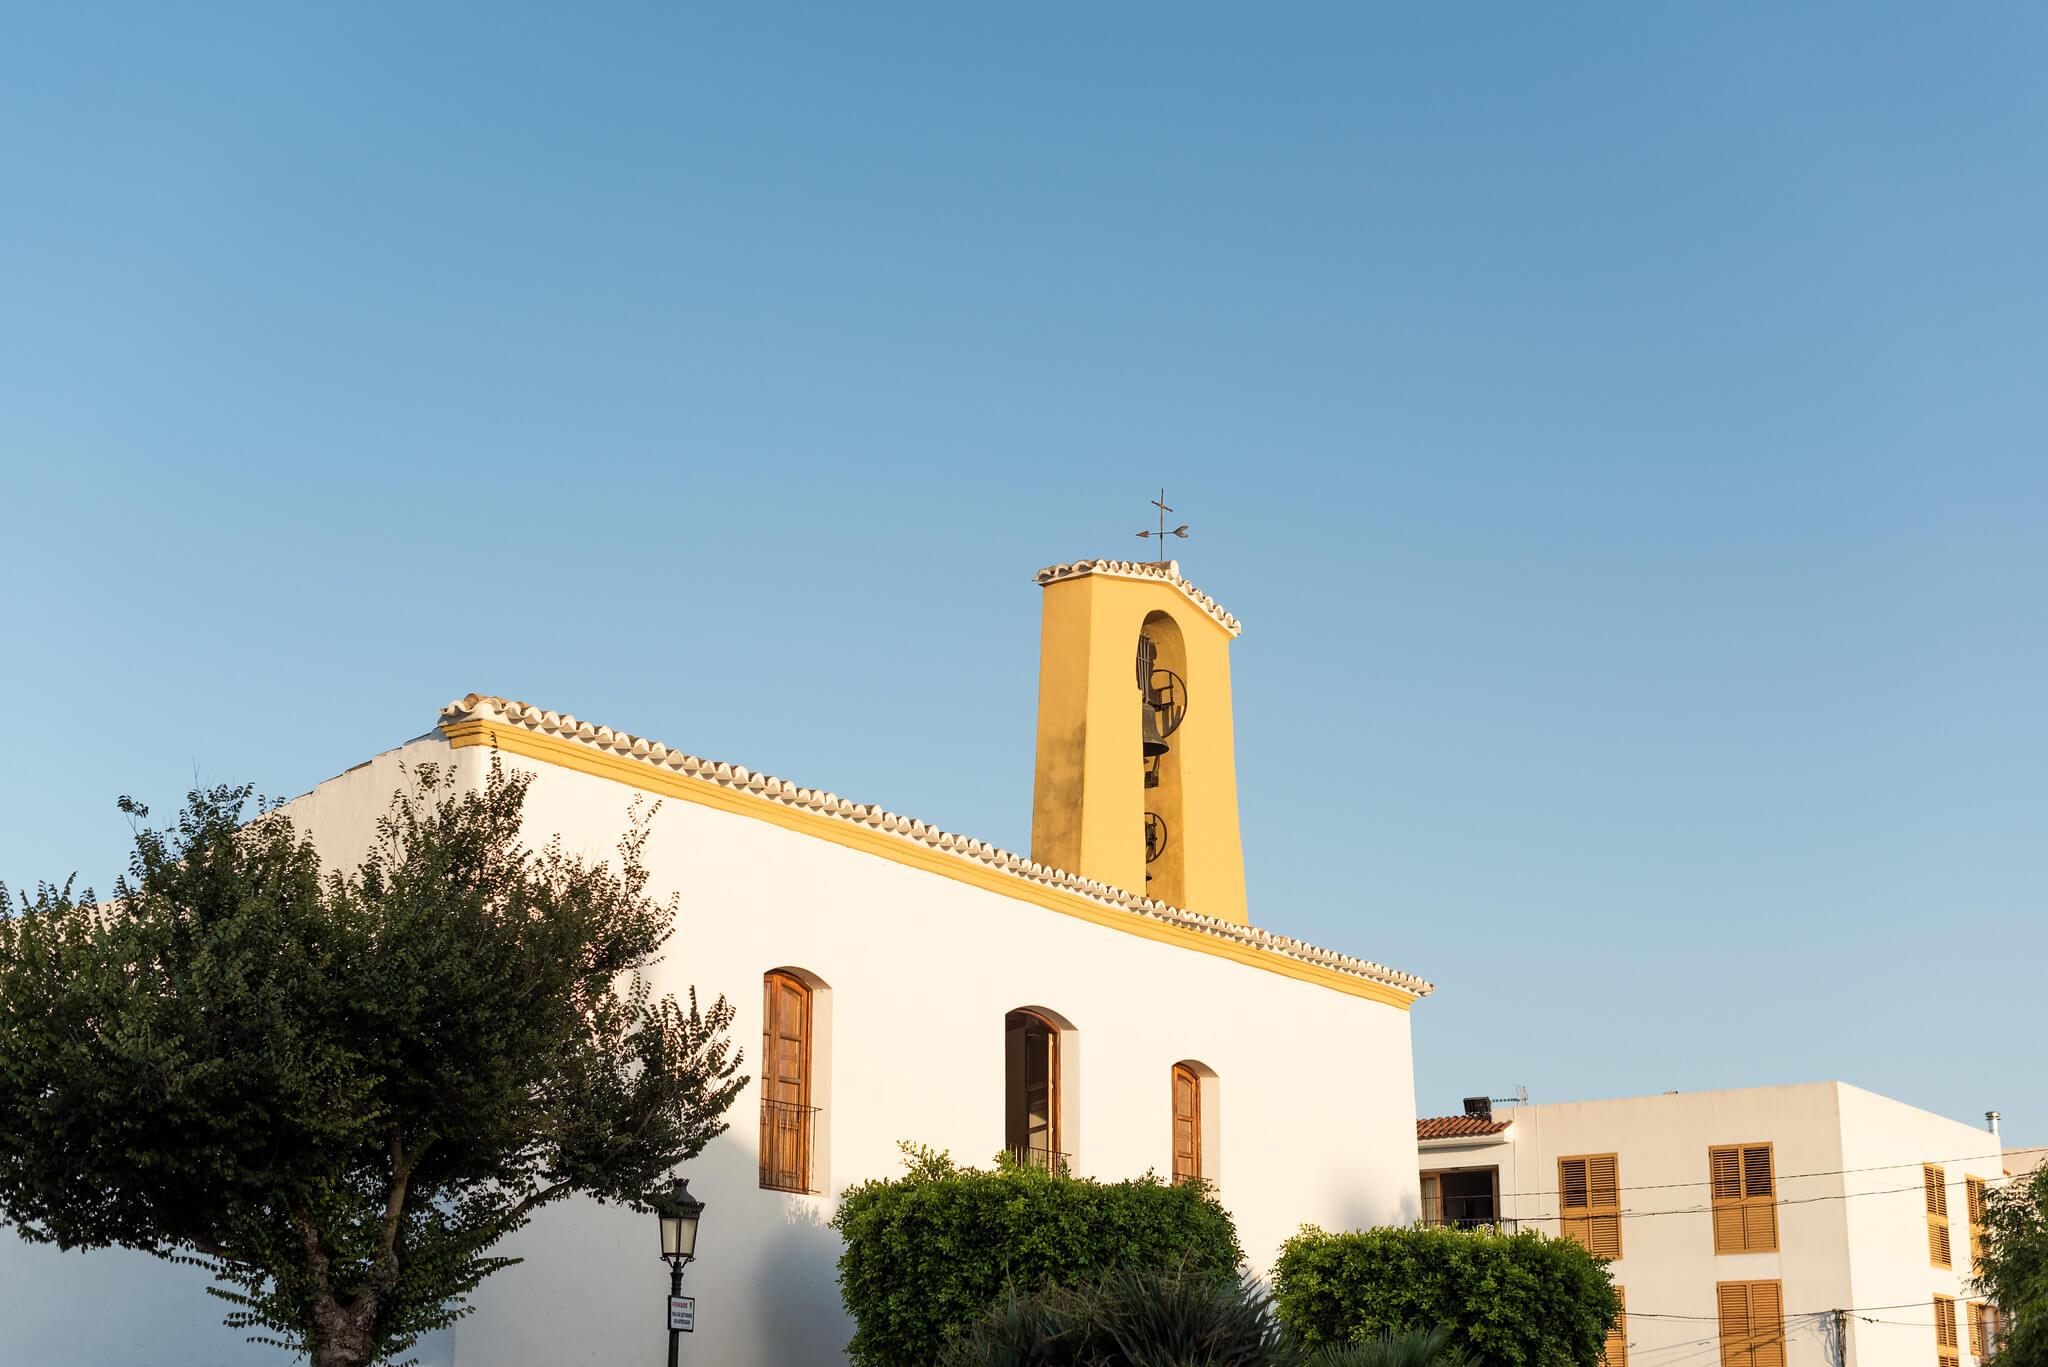 https://www.white-ibiza.com/wp-content/uploads/2020/05/white-ibiza-villas-where-to-stay-santa-gertrudis-04.jpg